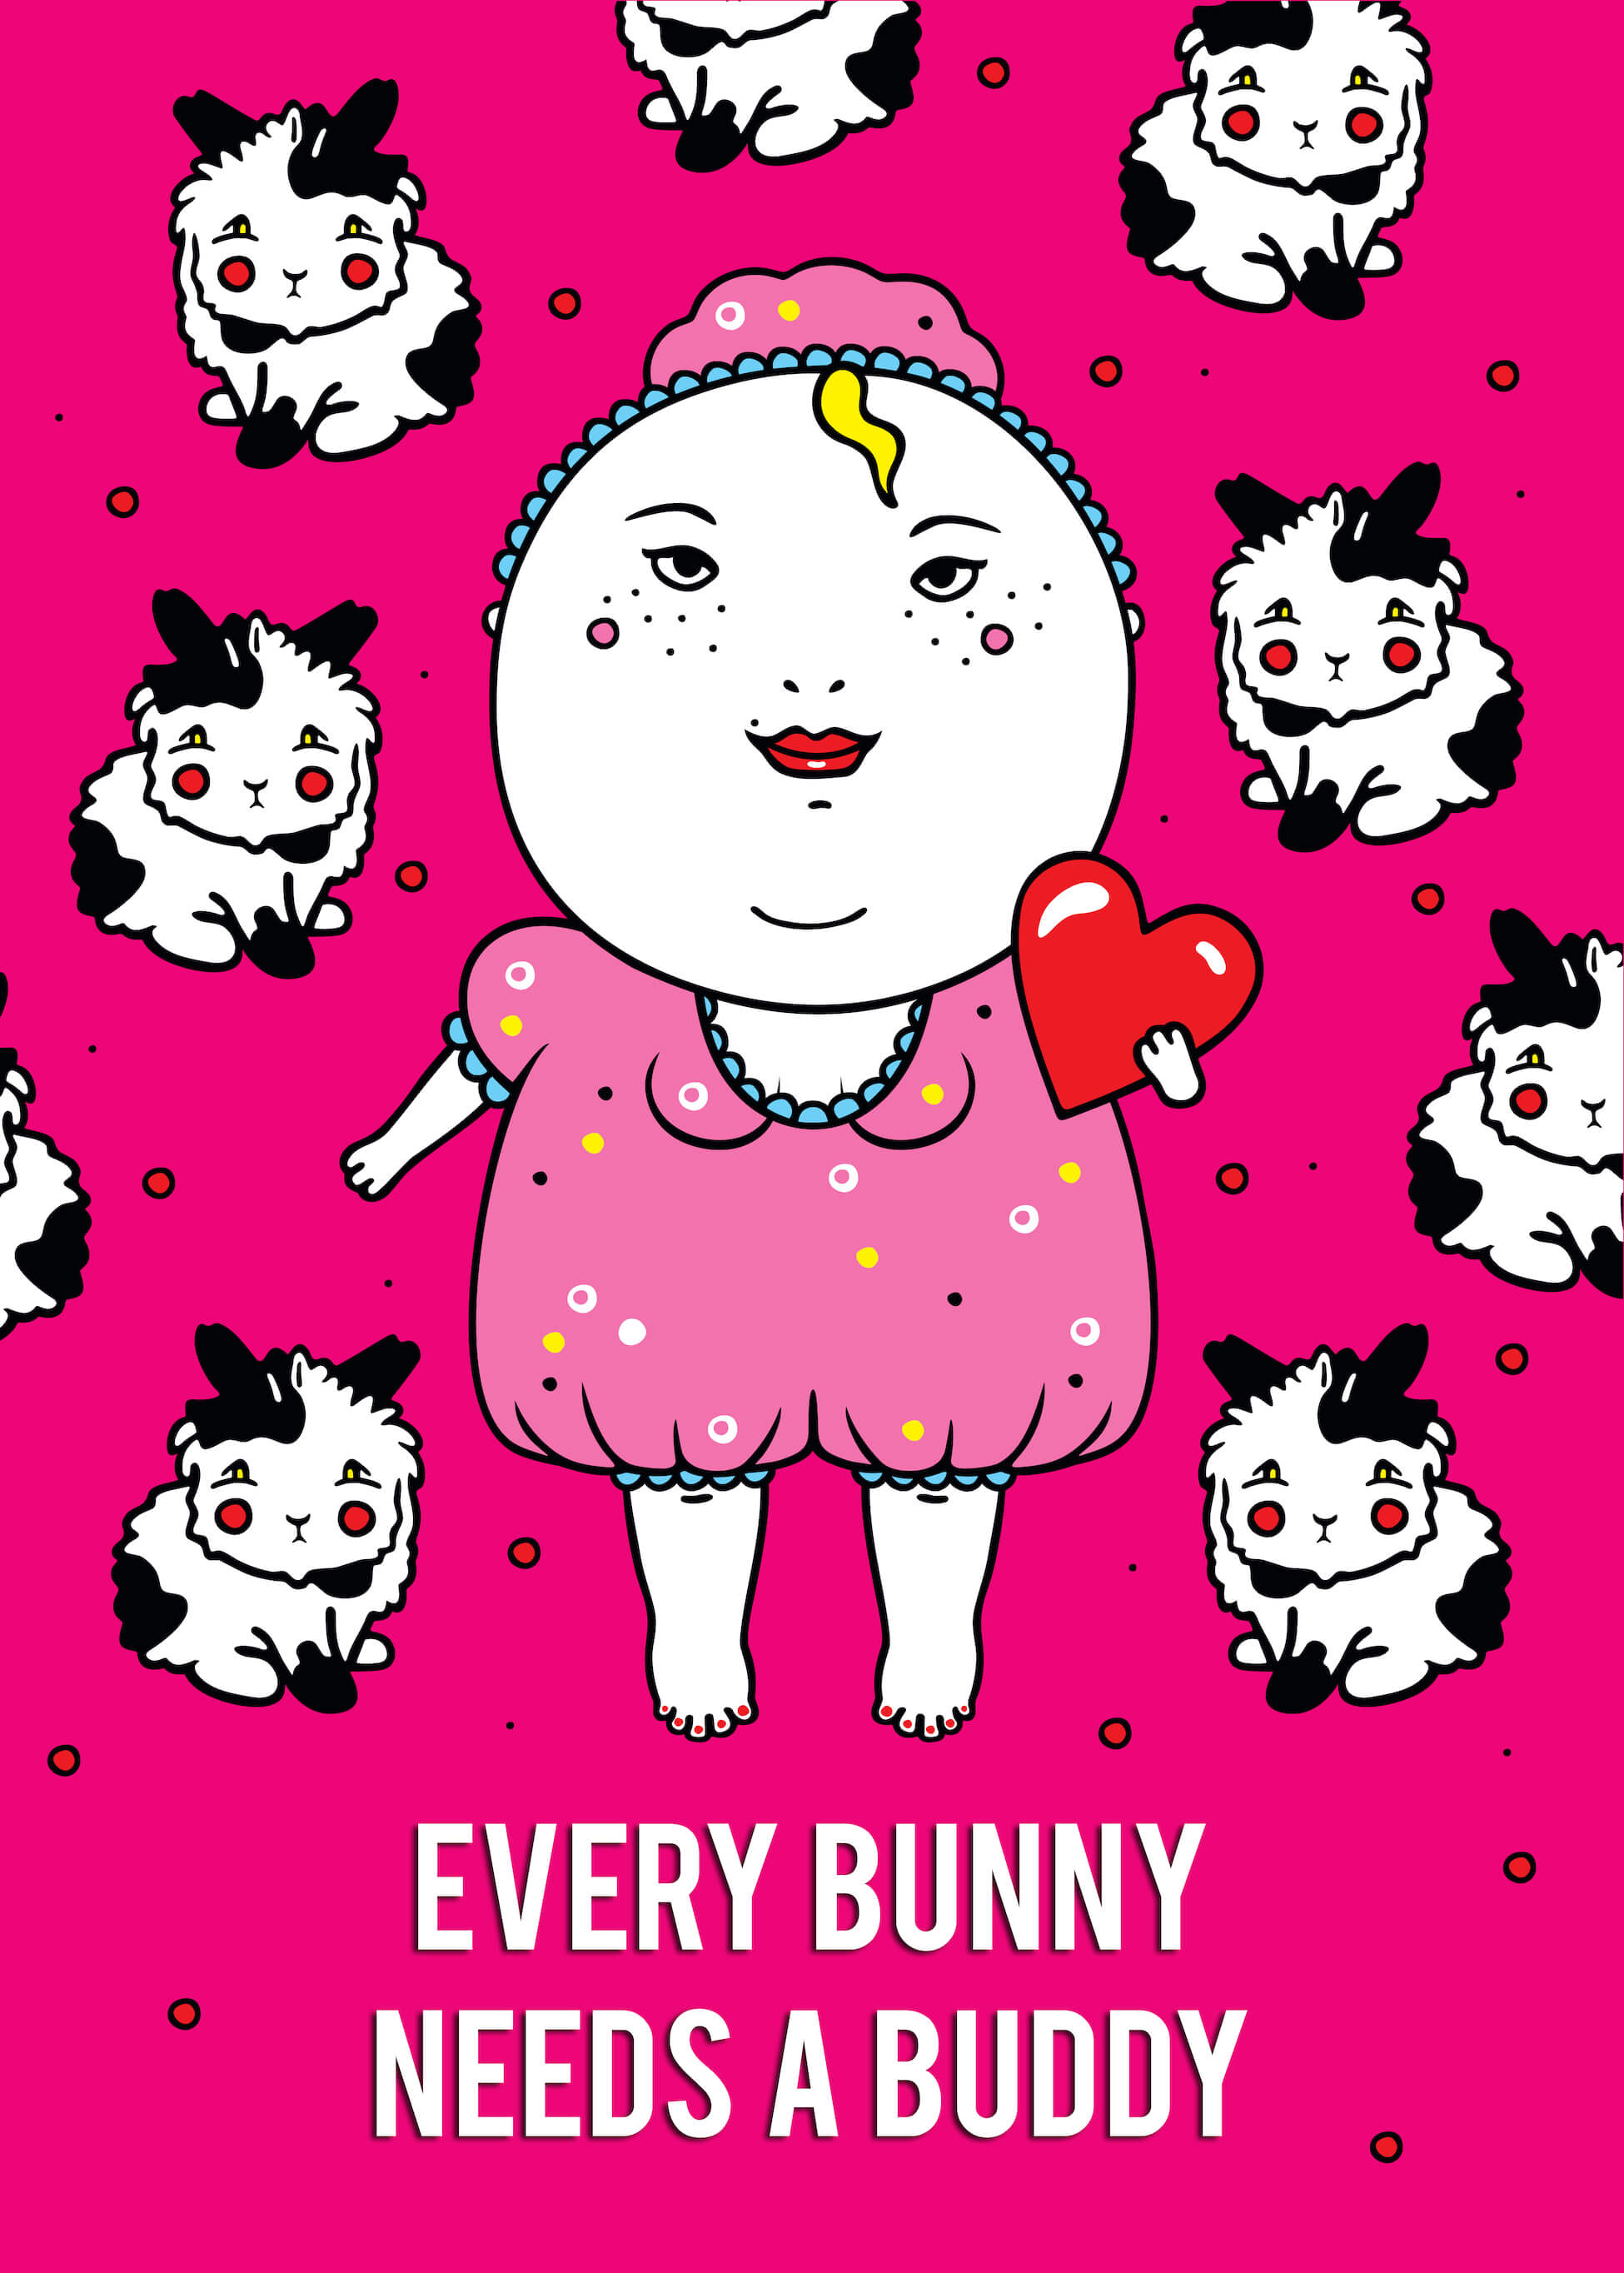 Every Bunny Needs A Buddy main image